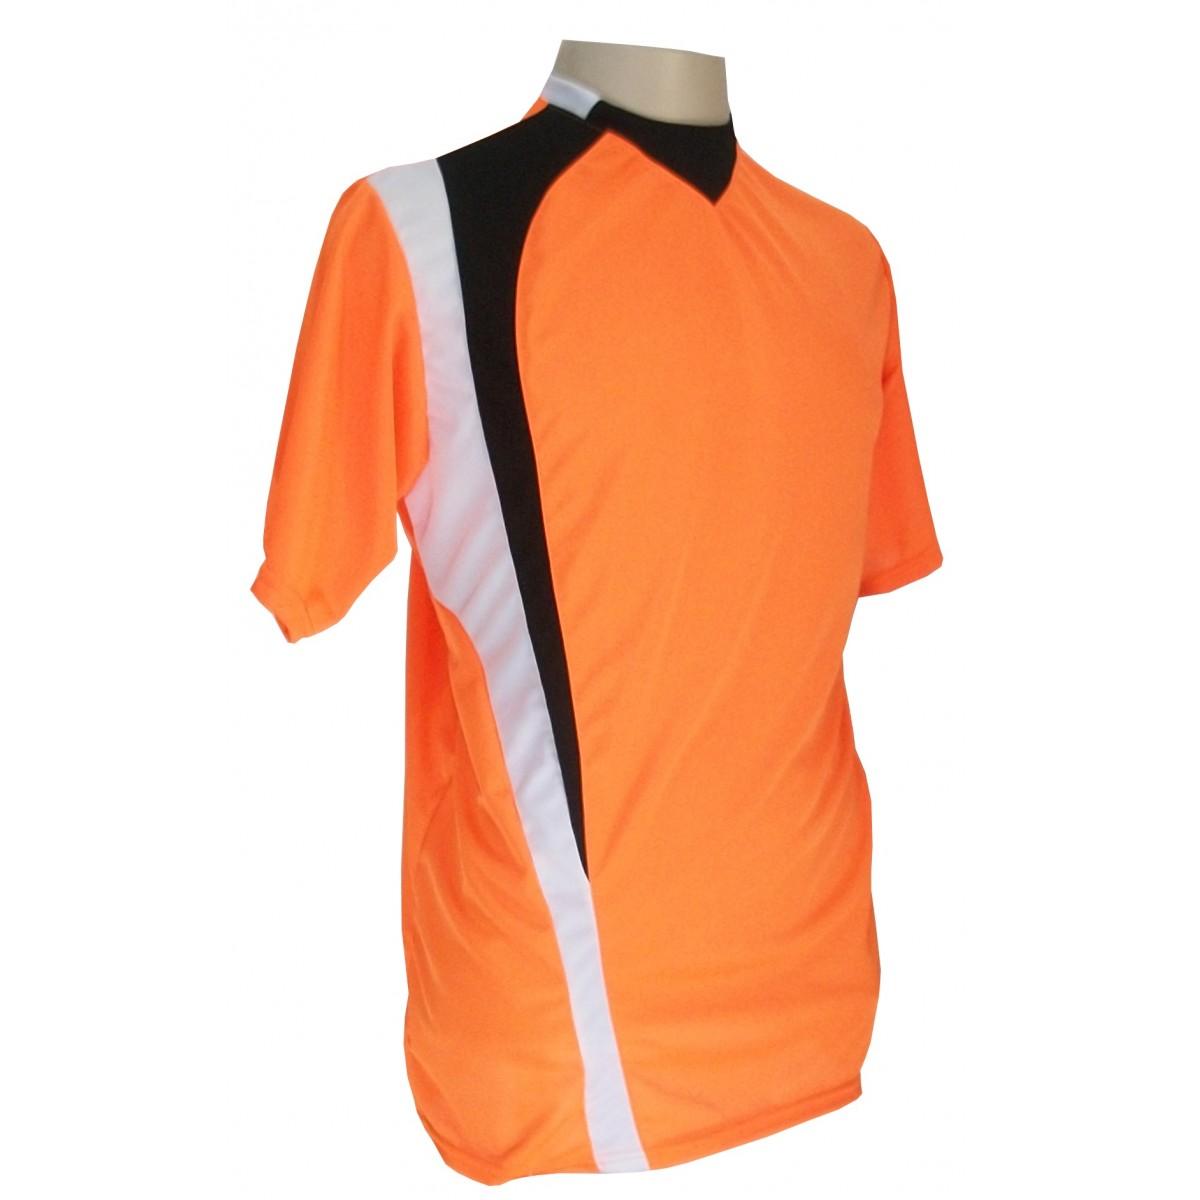 Jogo de Camisa com 14 unidades modelo PSG Laranja/Preto/Branco + Brindes